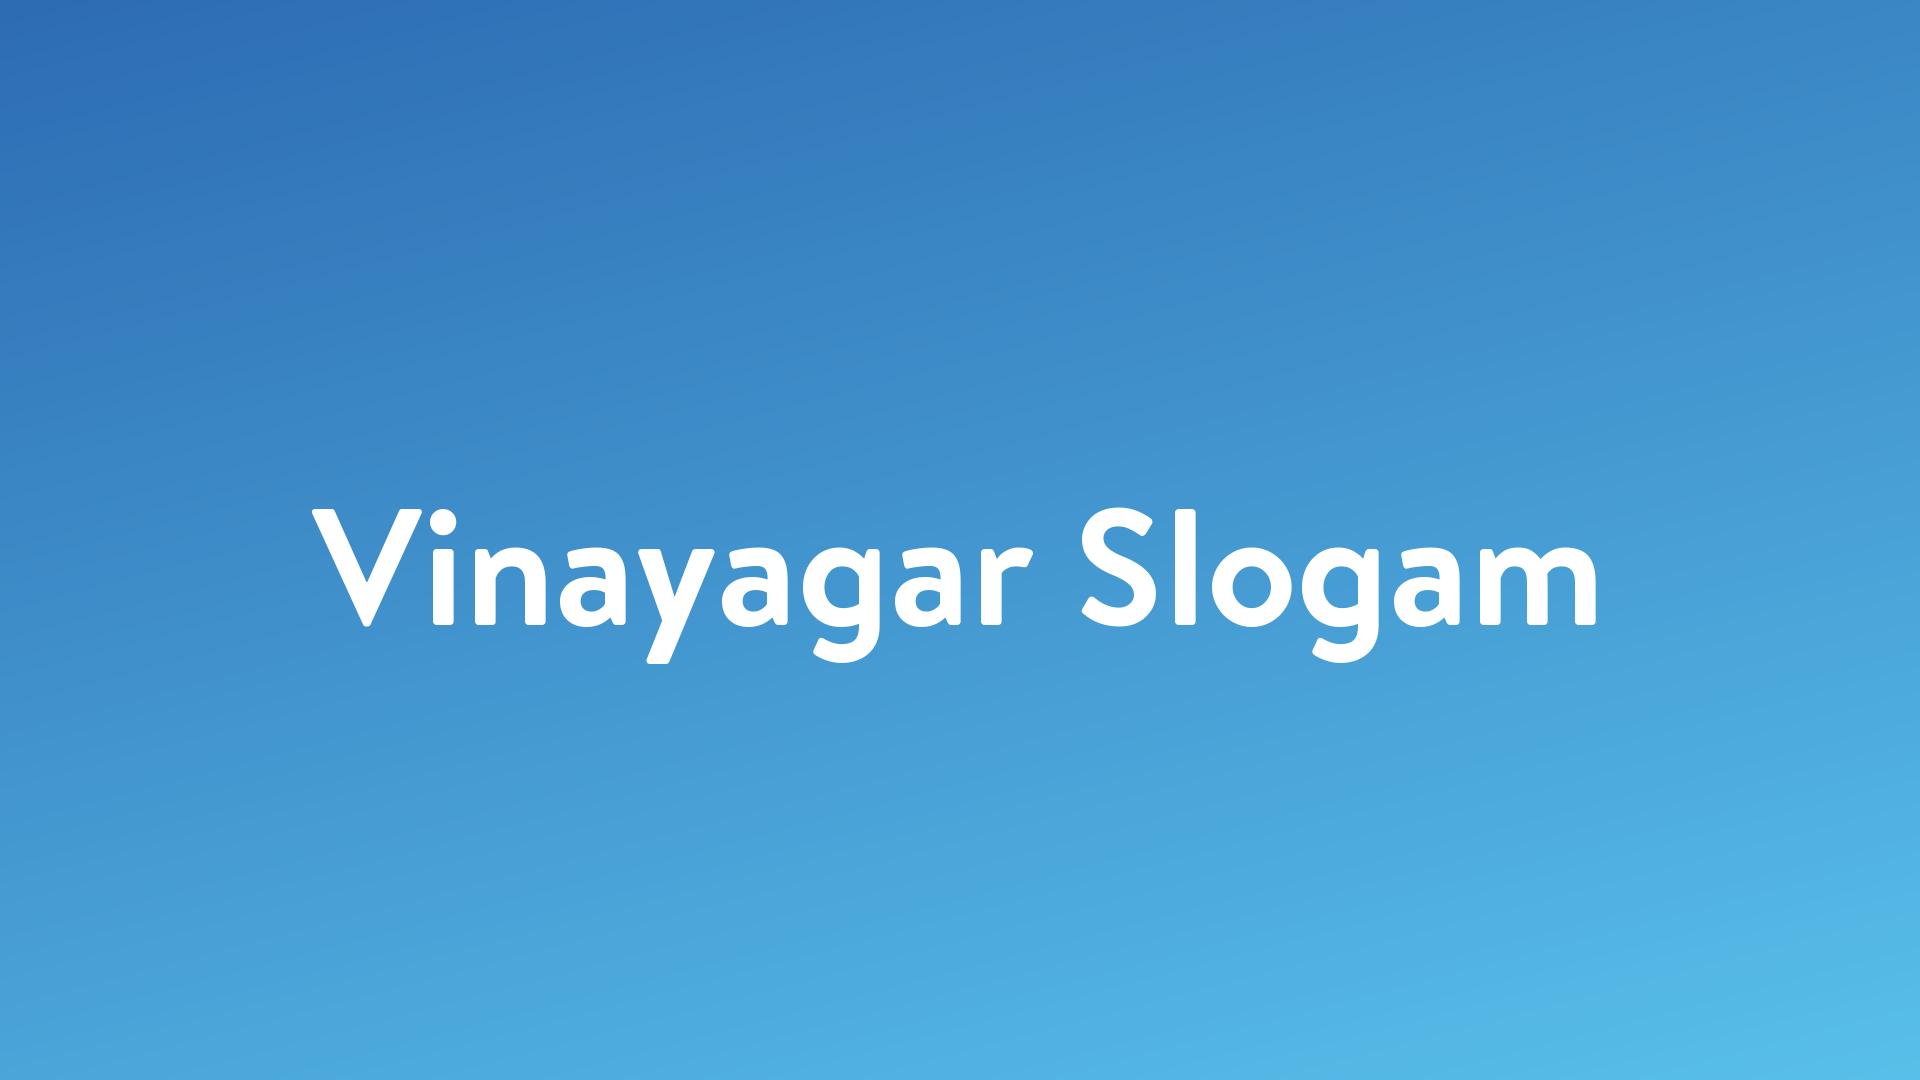 Stream And Watch Vinayagar Slogam Online | Sling TV